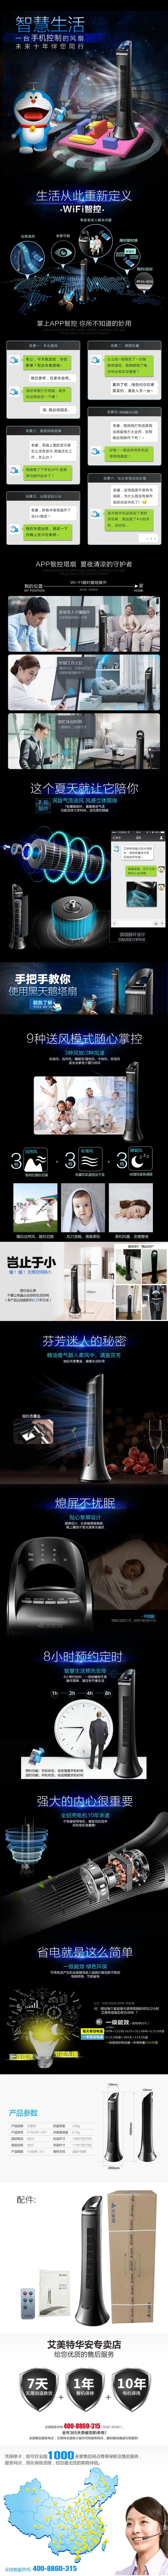 wifi智能塔扇 电子商务/商城 网页 cnpnt